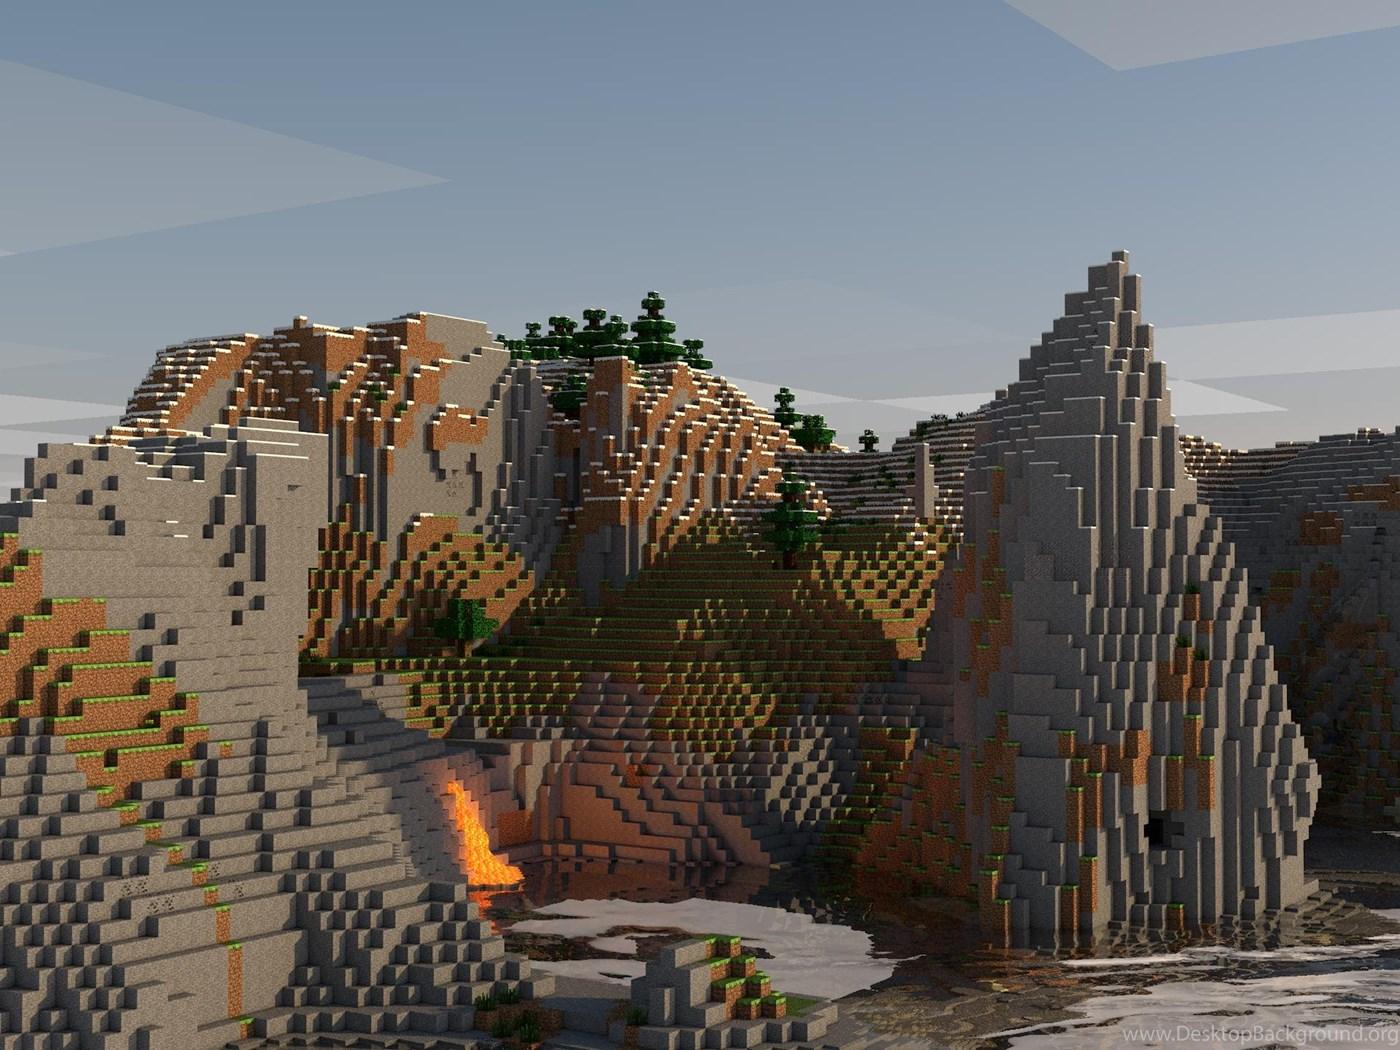 Top Wallpaper Minecraft Wall - 108232_1-7-2-minecraft-wallpapers-screenshots-show-your-creation_2560x1440_h  Collection_9495.jpg